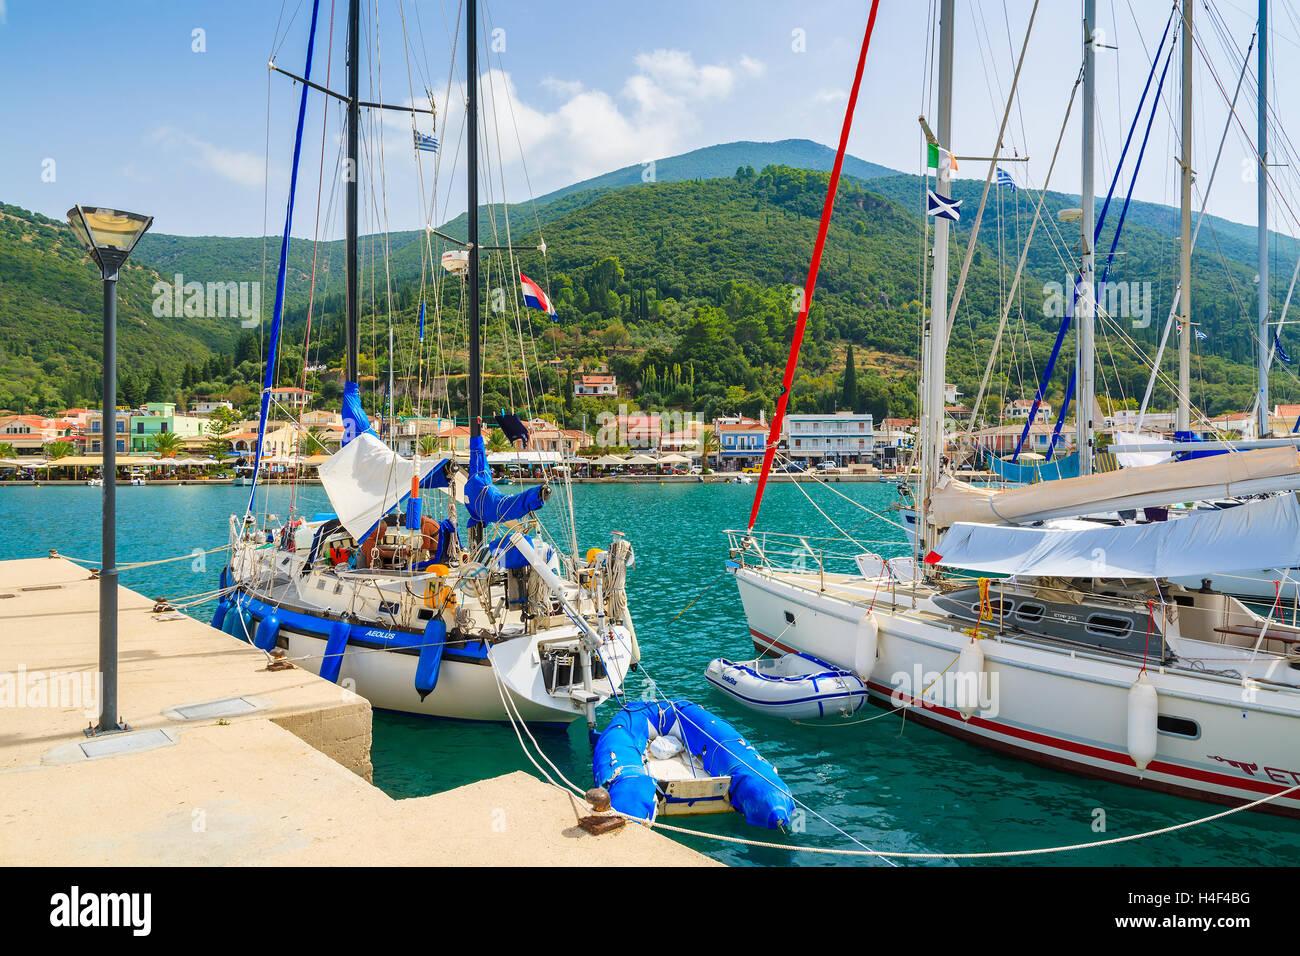 SAMI PORT, ITHAKA ISLAND, GREECE - SEP 21, 2014: yacht boats in port of Sami on Kefalonia island. Sailing is a popular - Stock Image